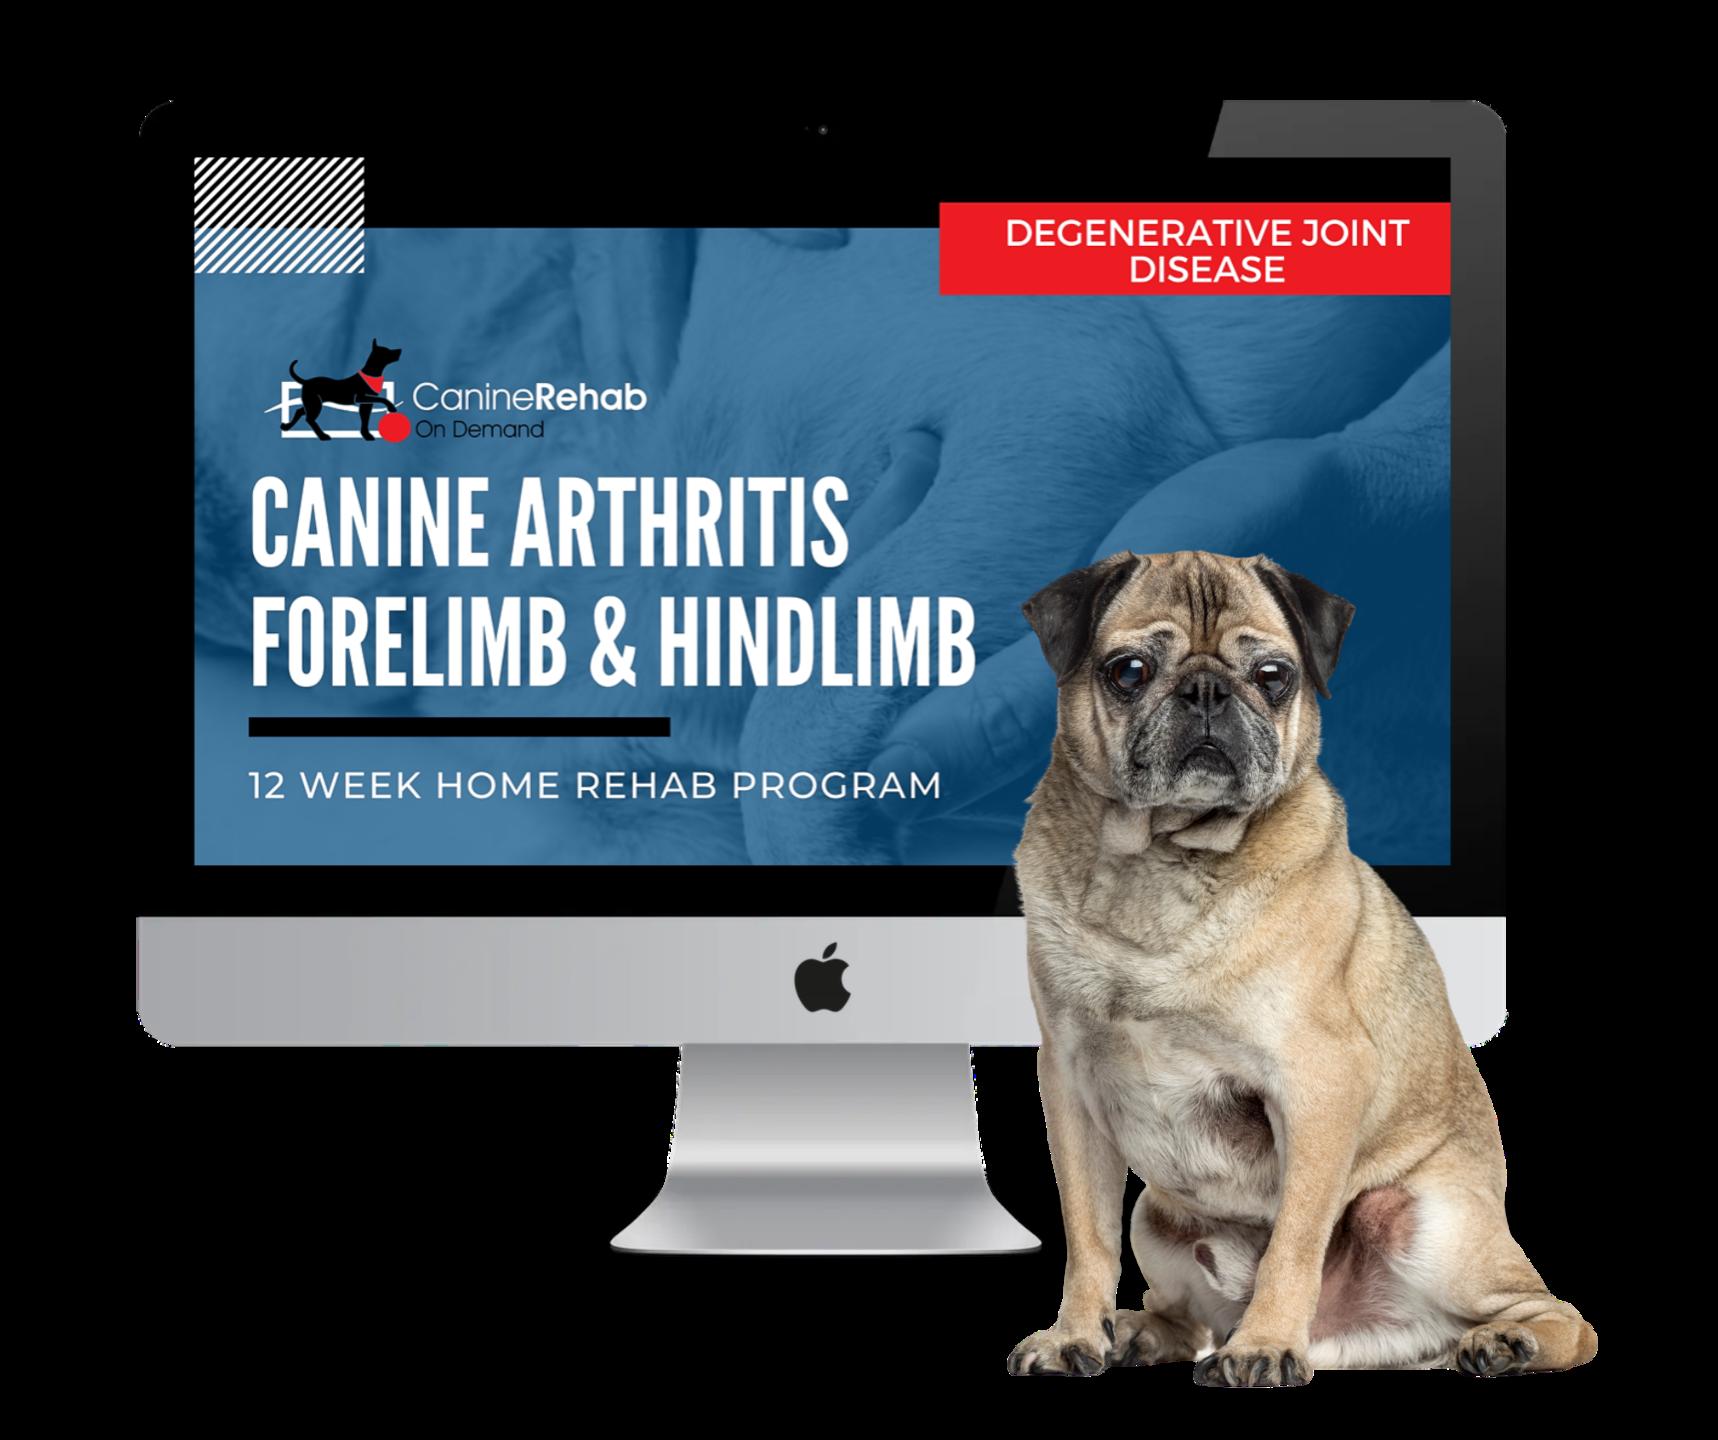 Canine Arthritis 12-Week Home Rehab Program